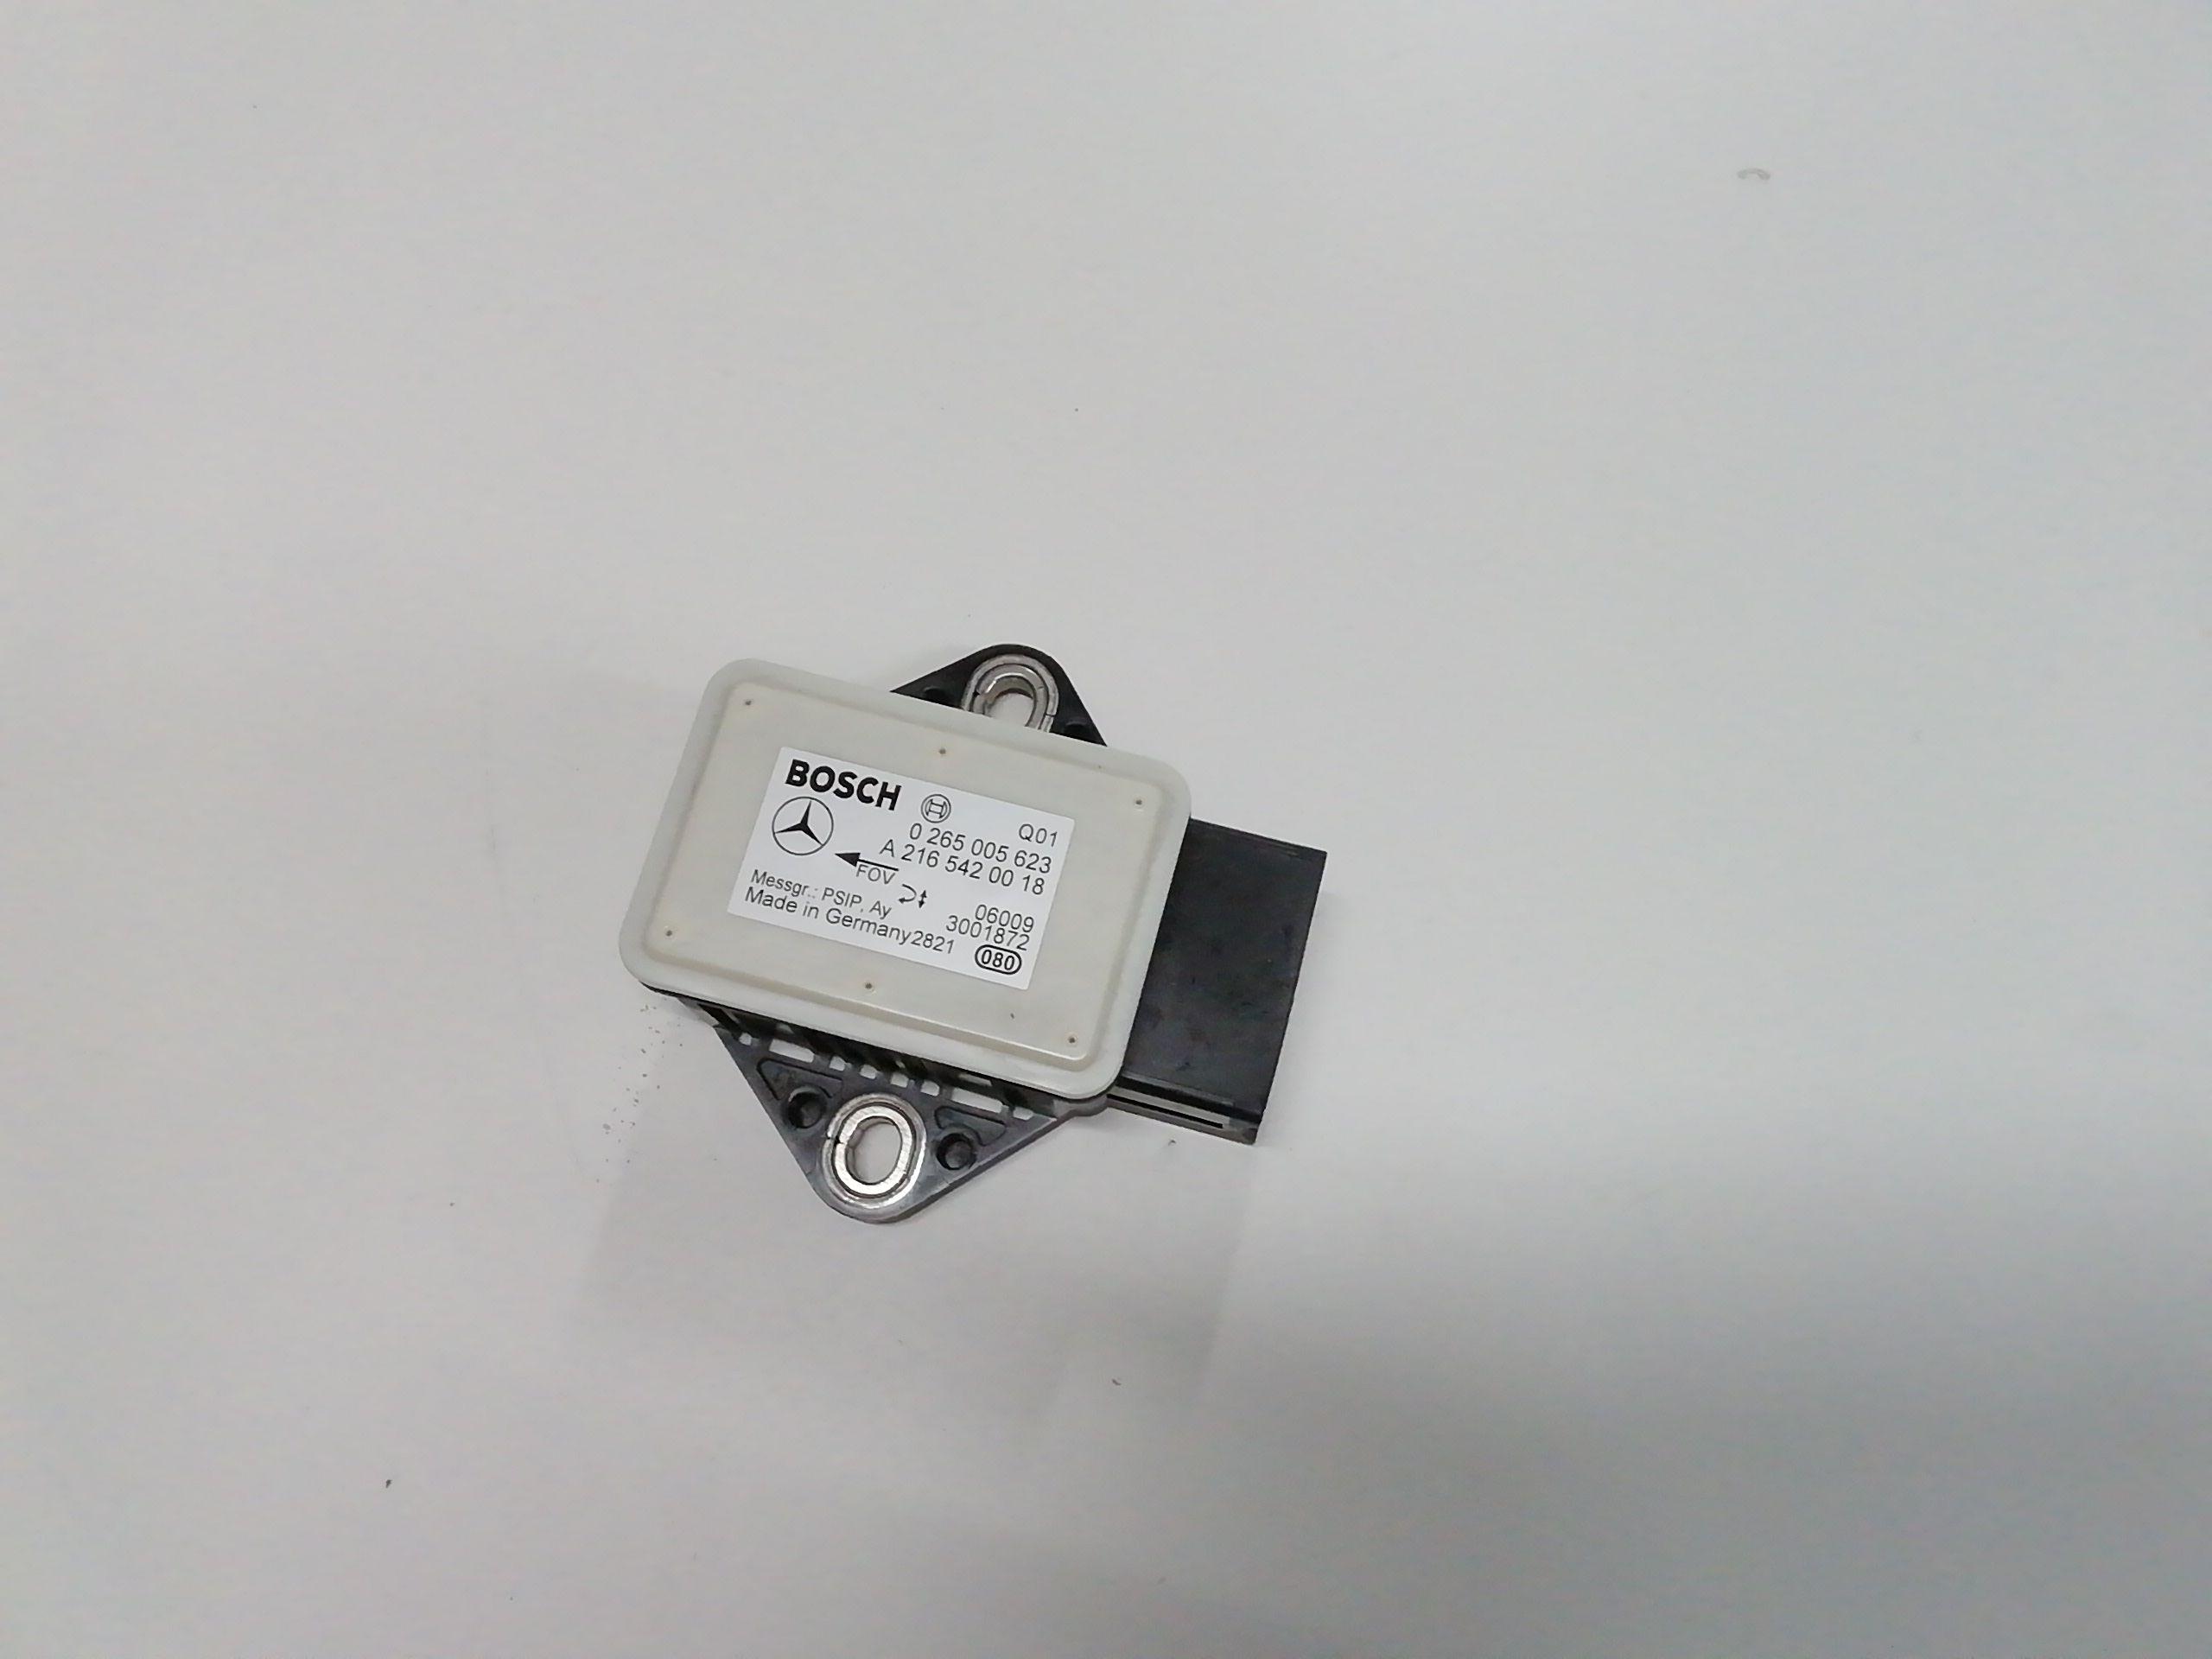 A2165420018 SENSORE IMBARDATA MERCEDES Classe B W245 1° Serie 1500 Benzina 266920 (2006) RICAMBI USATI